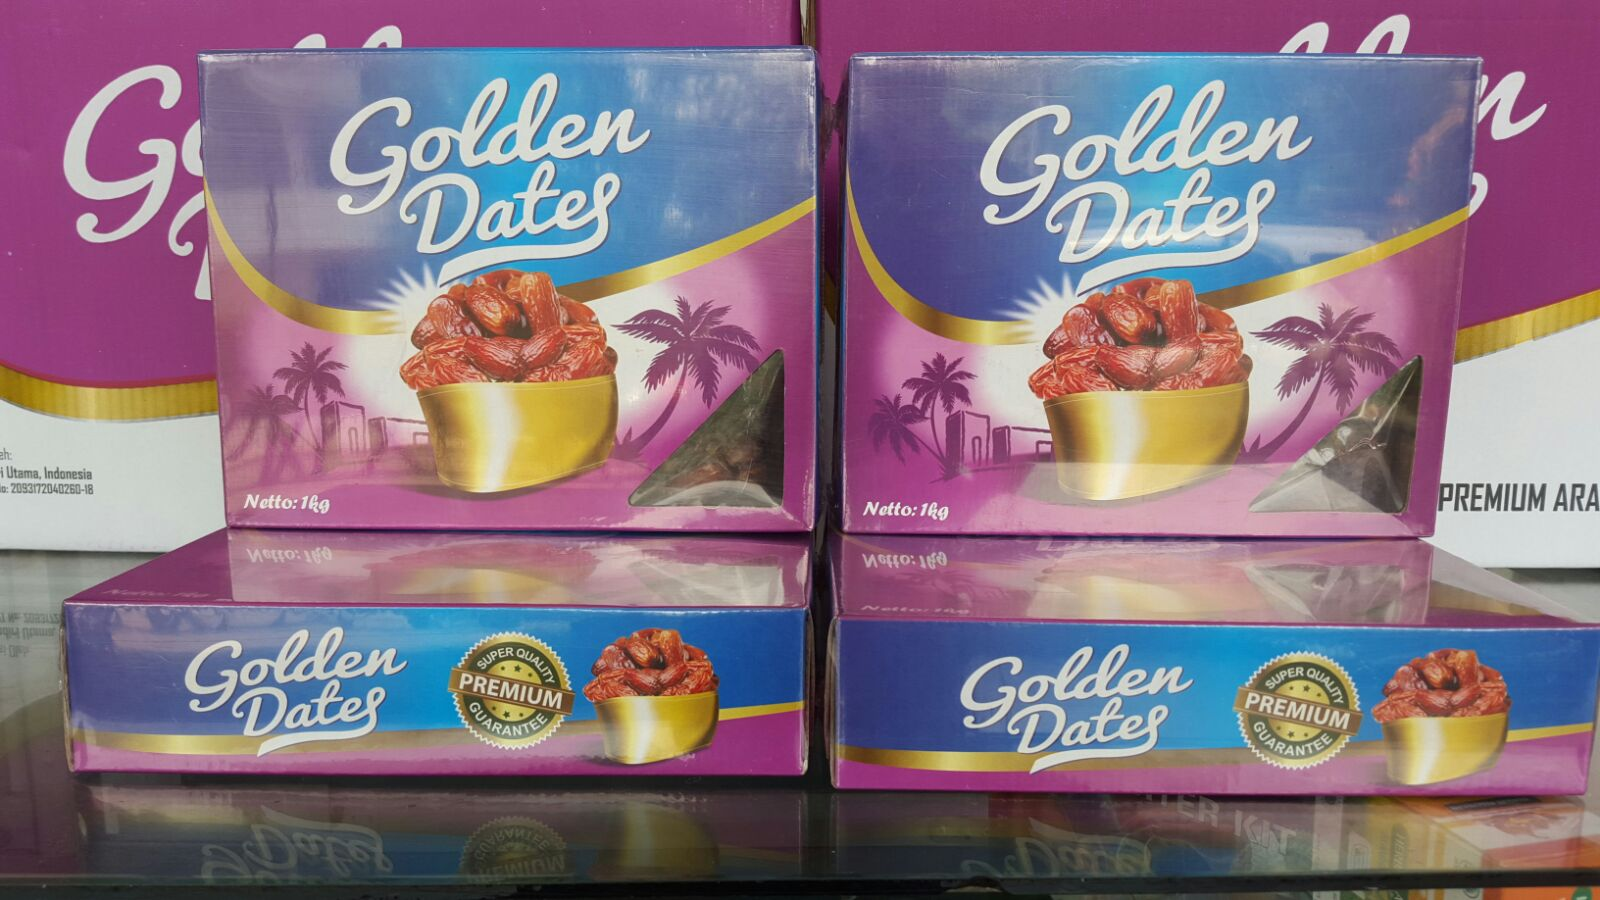 2 Paket Kurma Dates Golden Fruit Premium Emirates 1kg Khalas Hikmah Jual Grosir Harga Termurah Distributor Date Crown Palm Buah